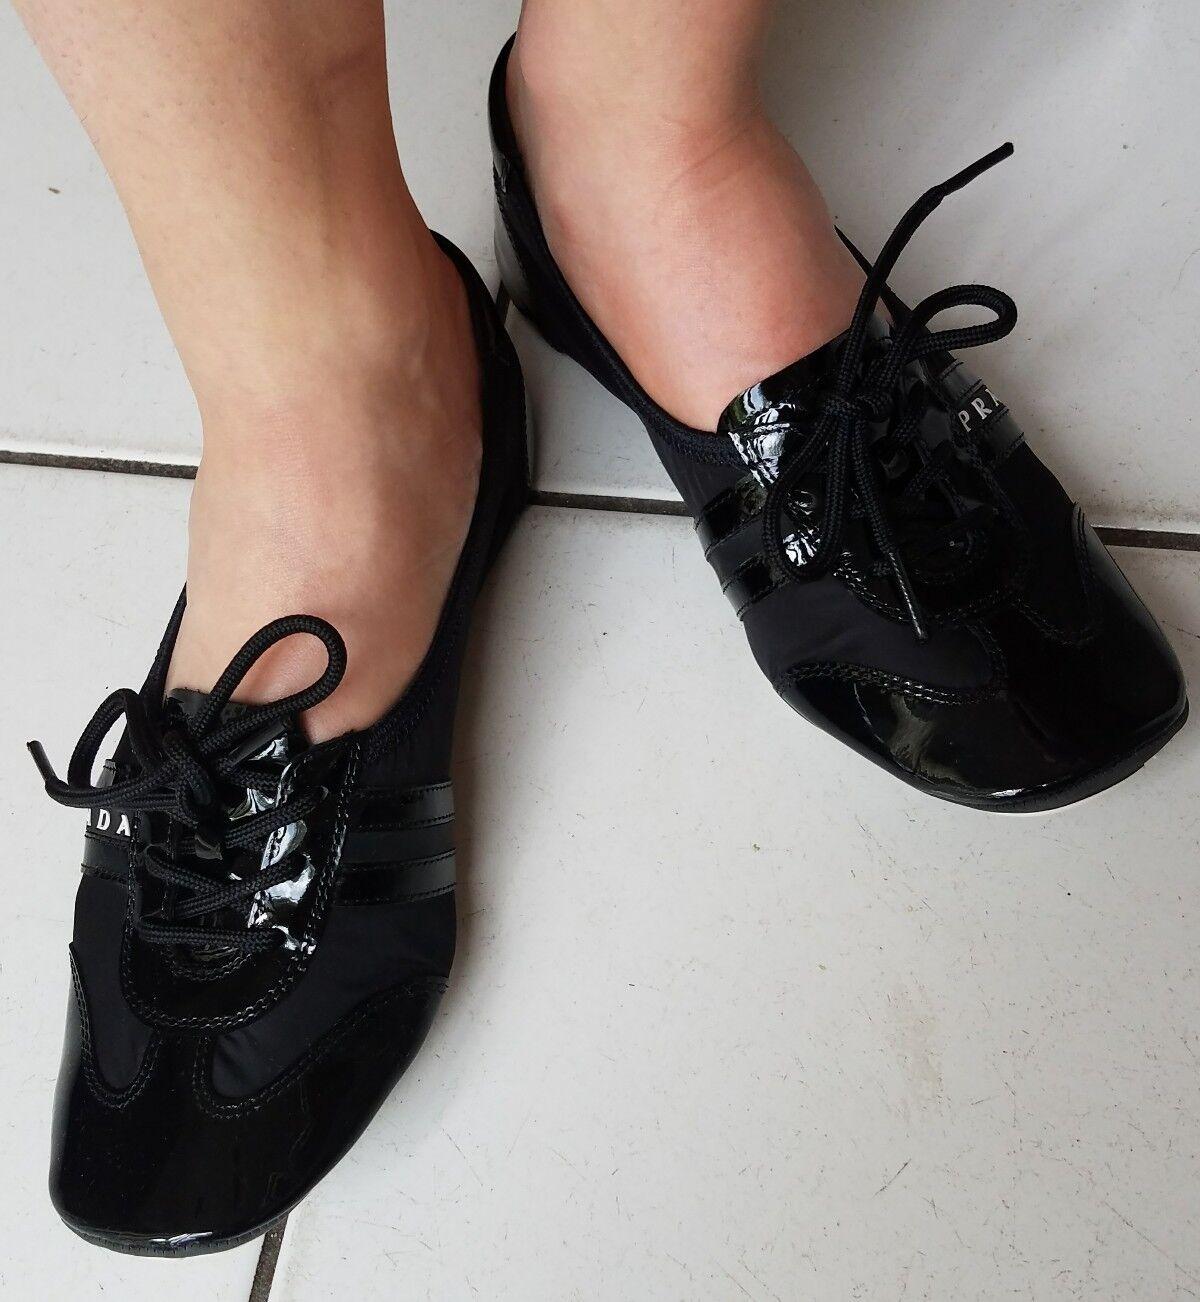 NIB PRADA nero Nylon  Patent  Flat scarpe - Nylon Piuma Lu -W's SZ 35 Retail  280  supporto al dettaglio all'ingrosso